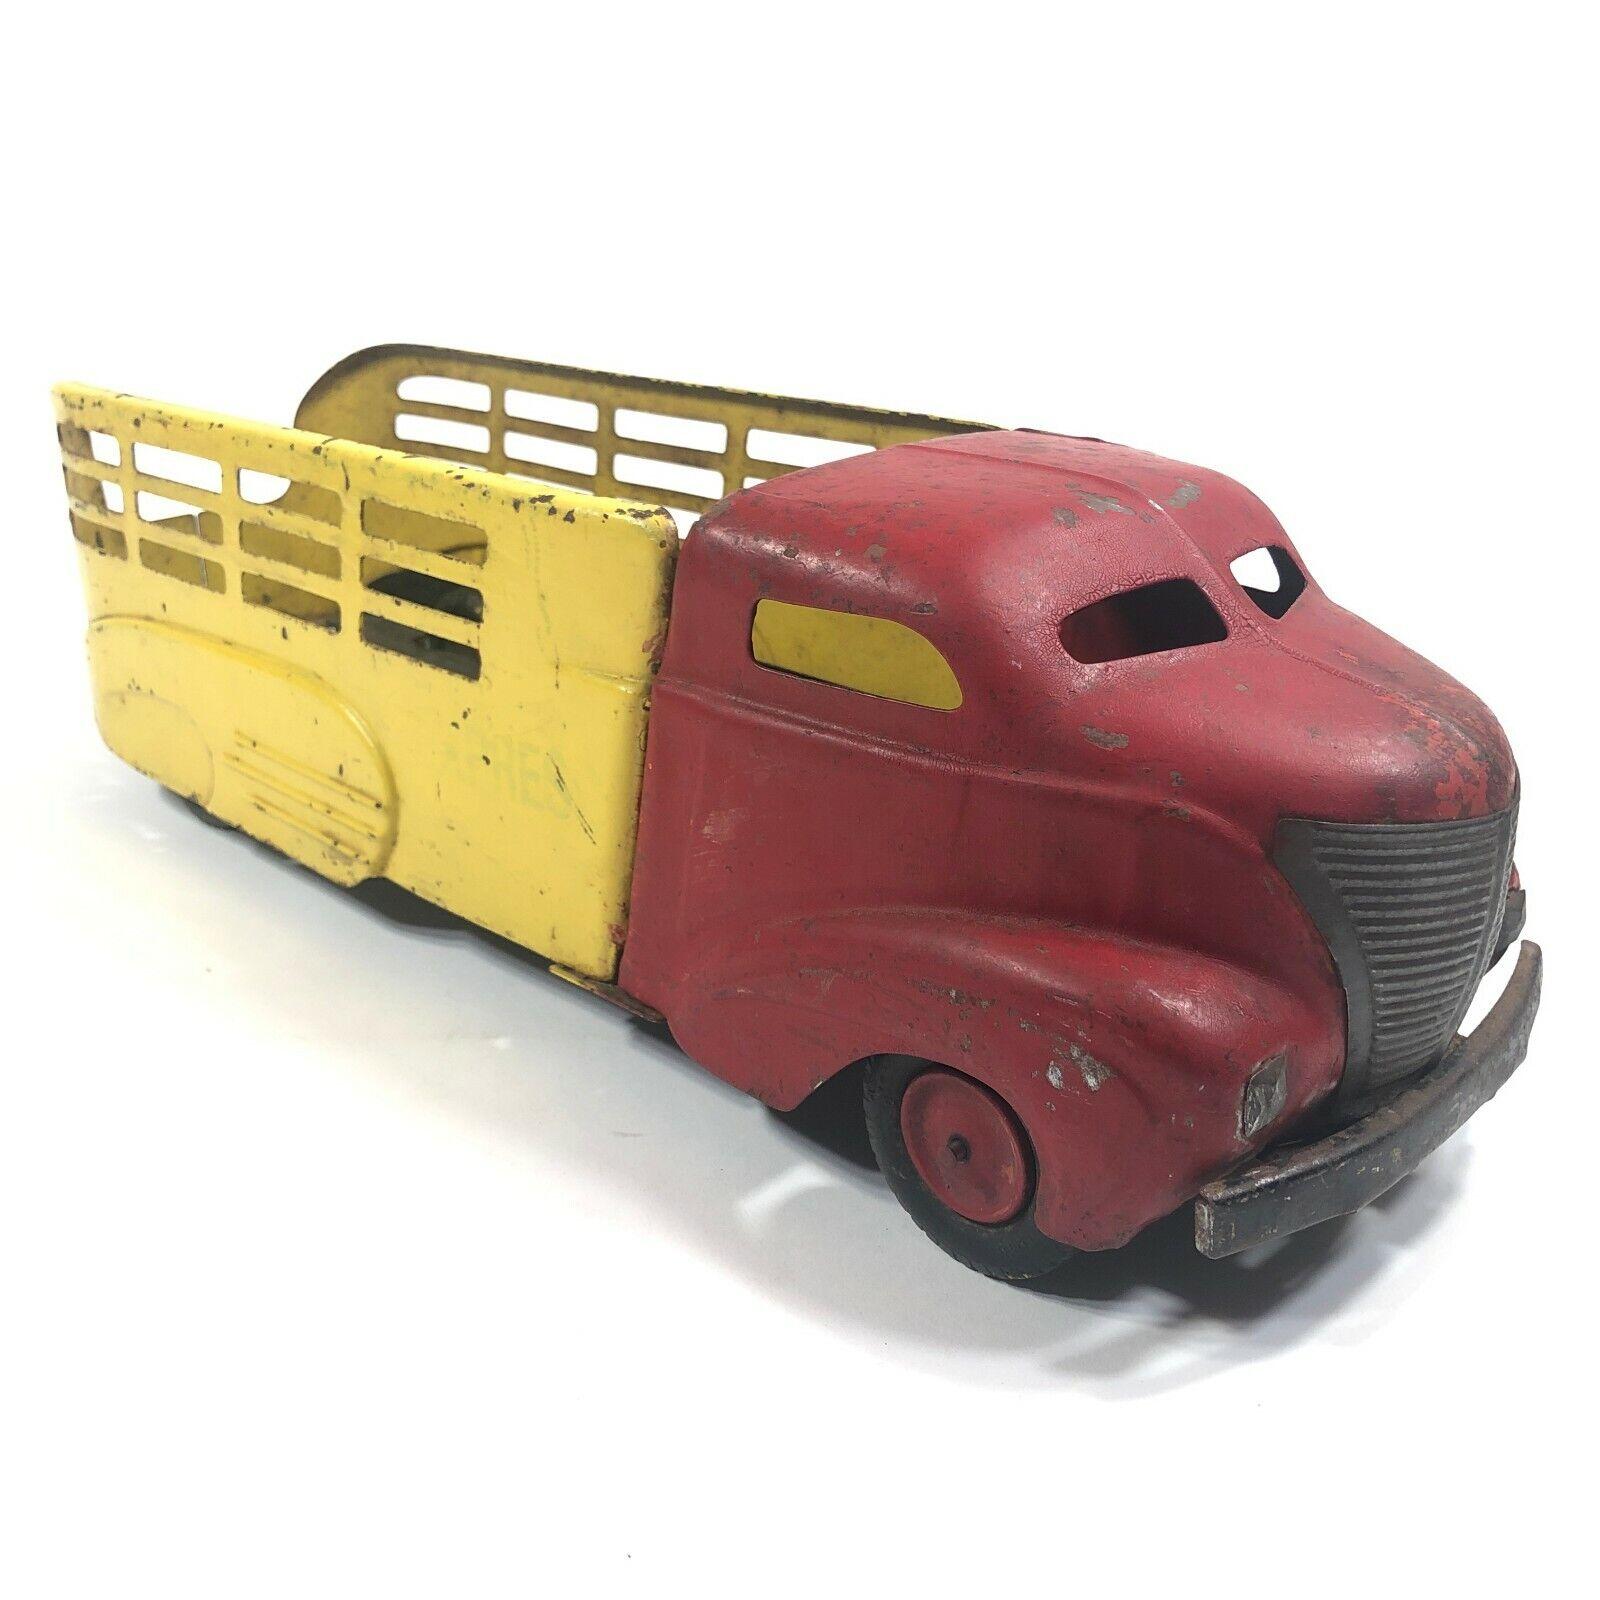 Vintage 1940 Wyandotte GMC Optimieren Kugel Nase Gepresst Stahl Spielzeug Kipper